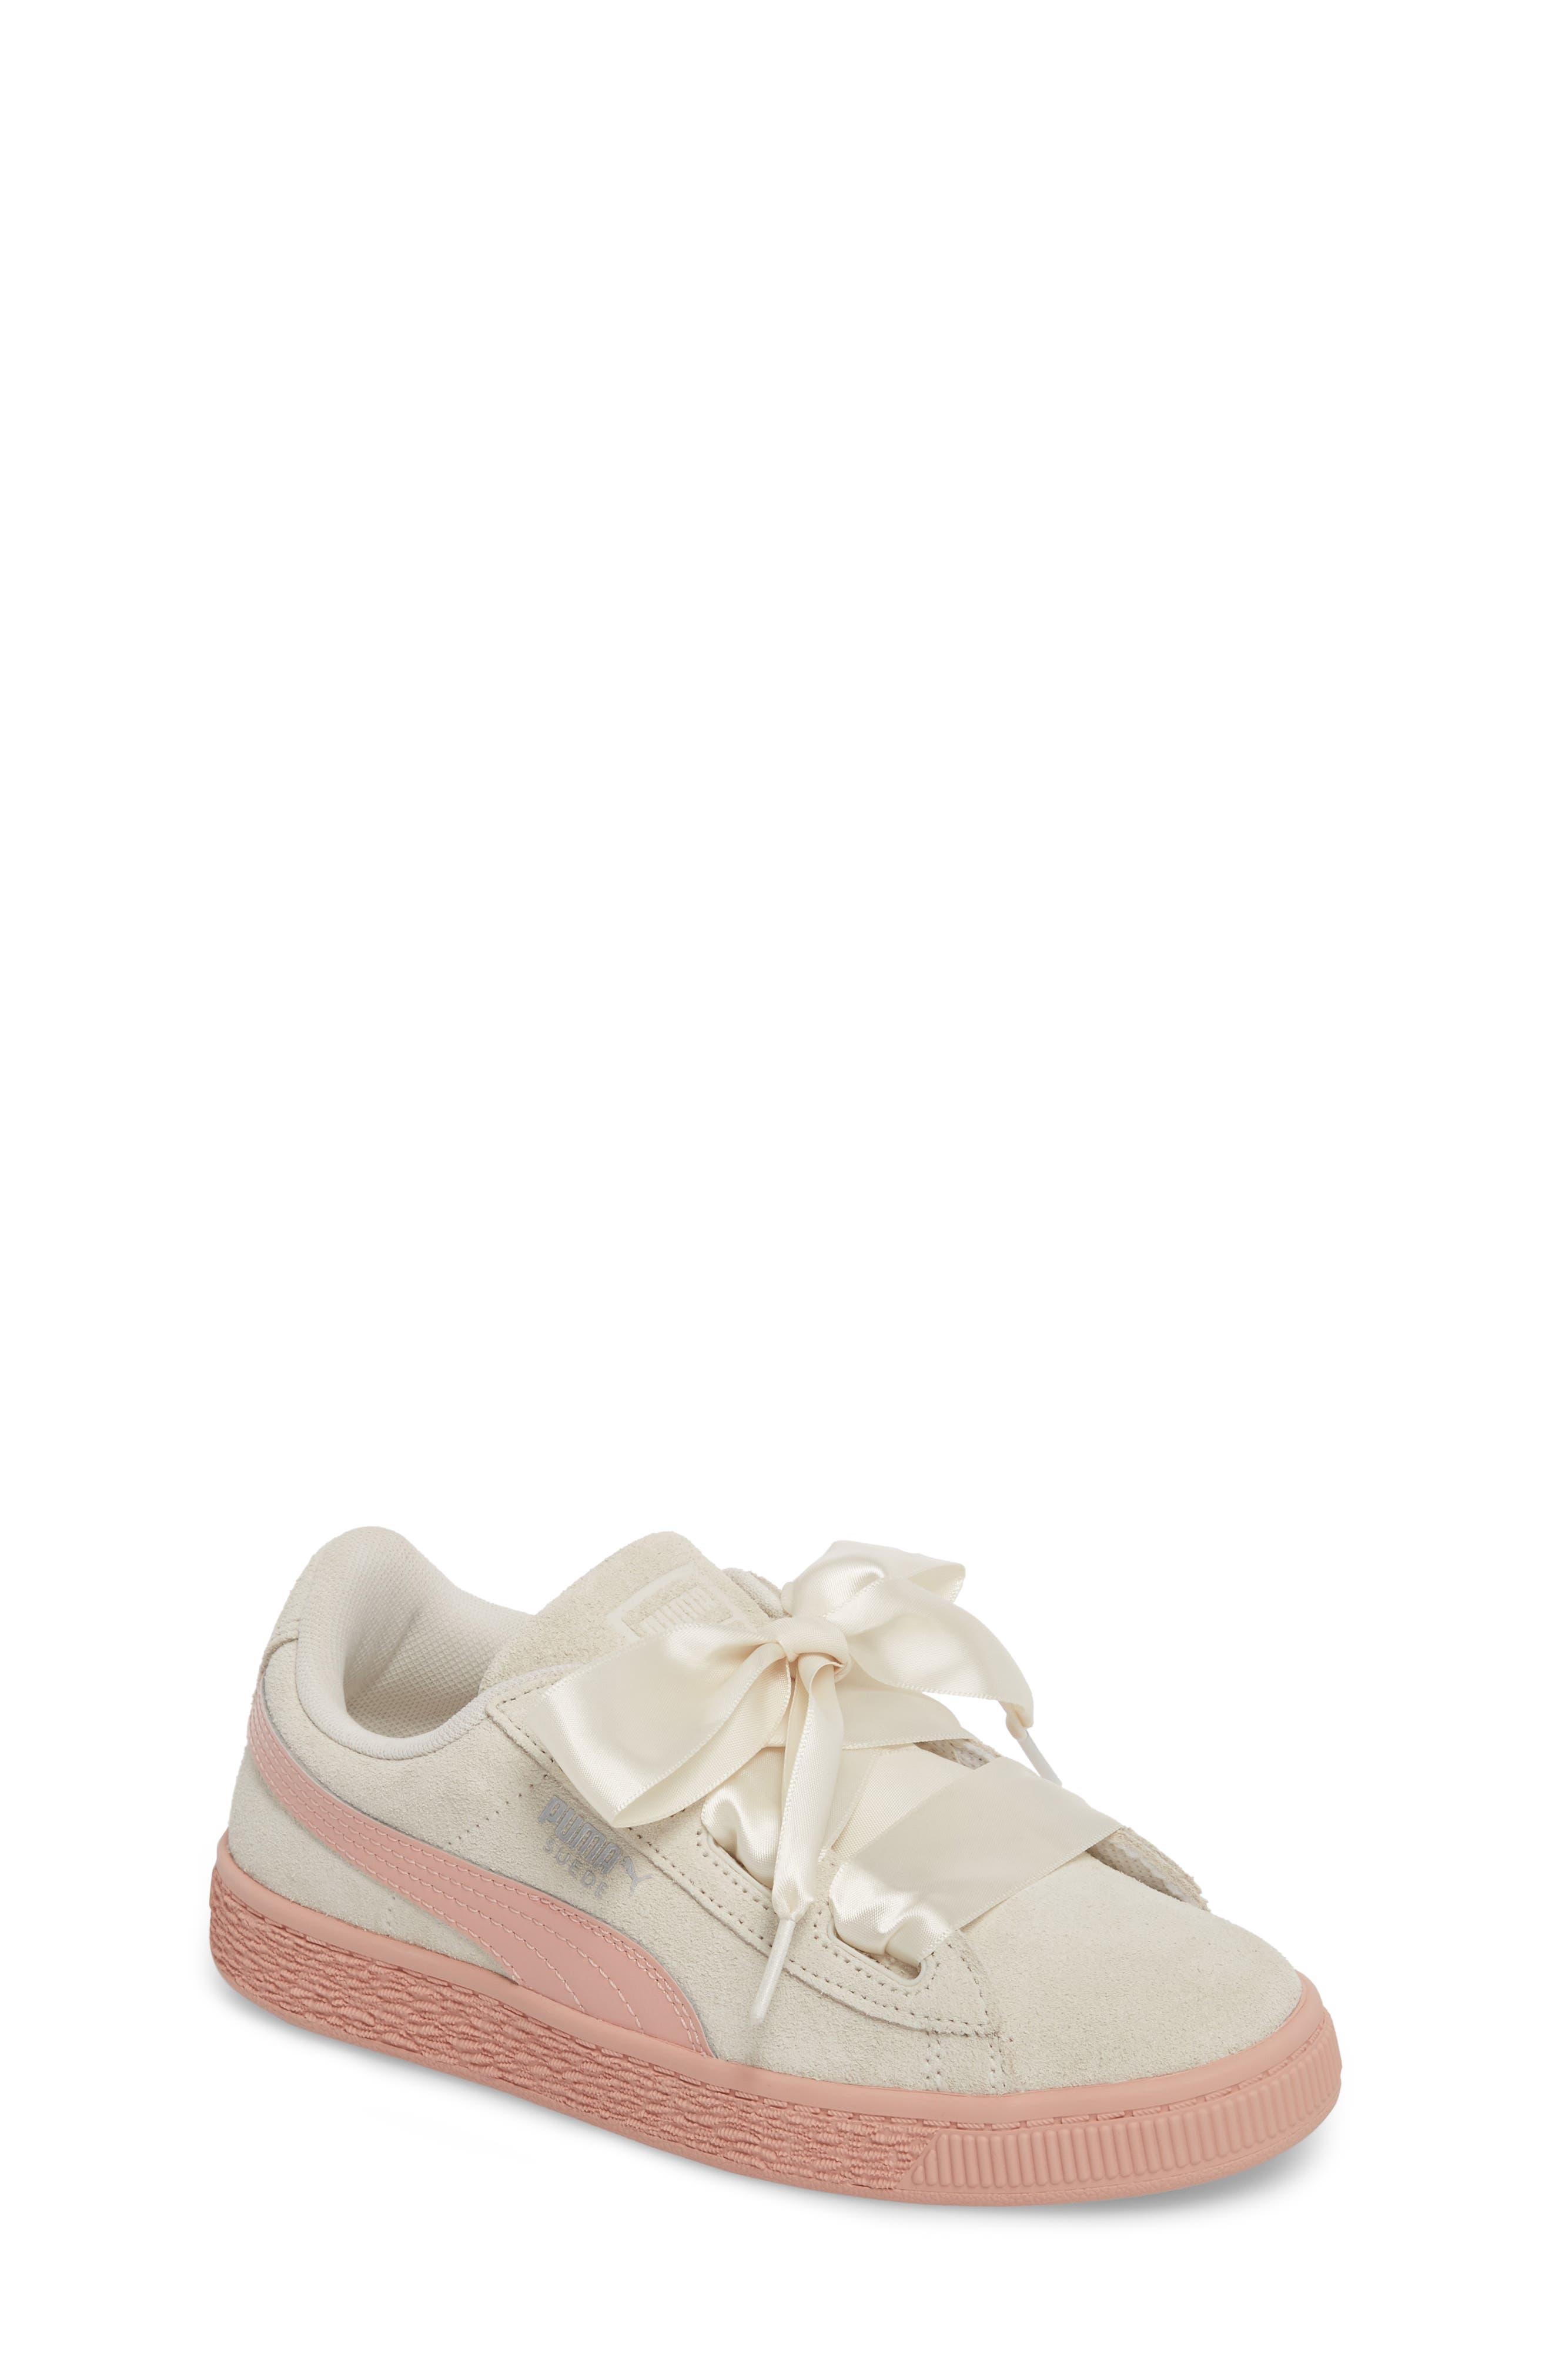 PUMA Suede Heart Sneaker (Baby, Walker, Toddler, Little Kid & Big Kid)